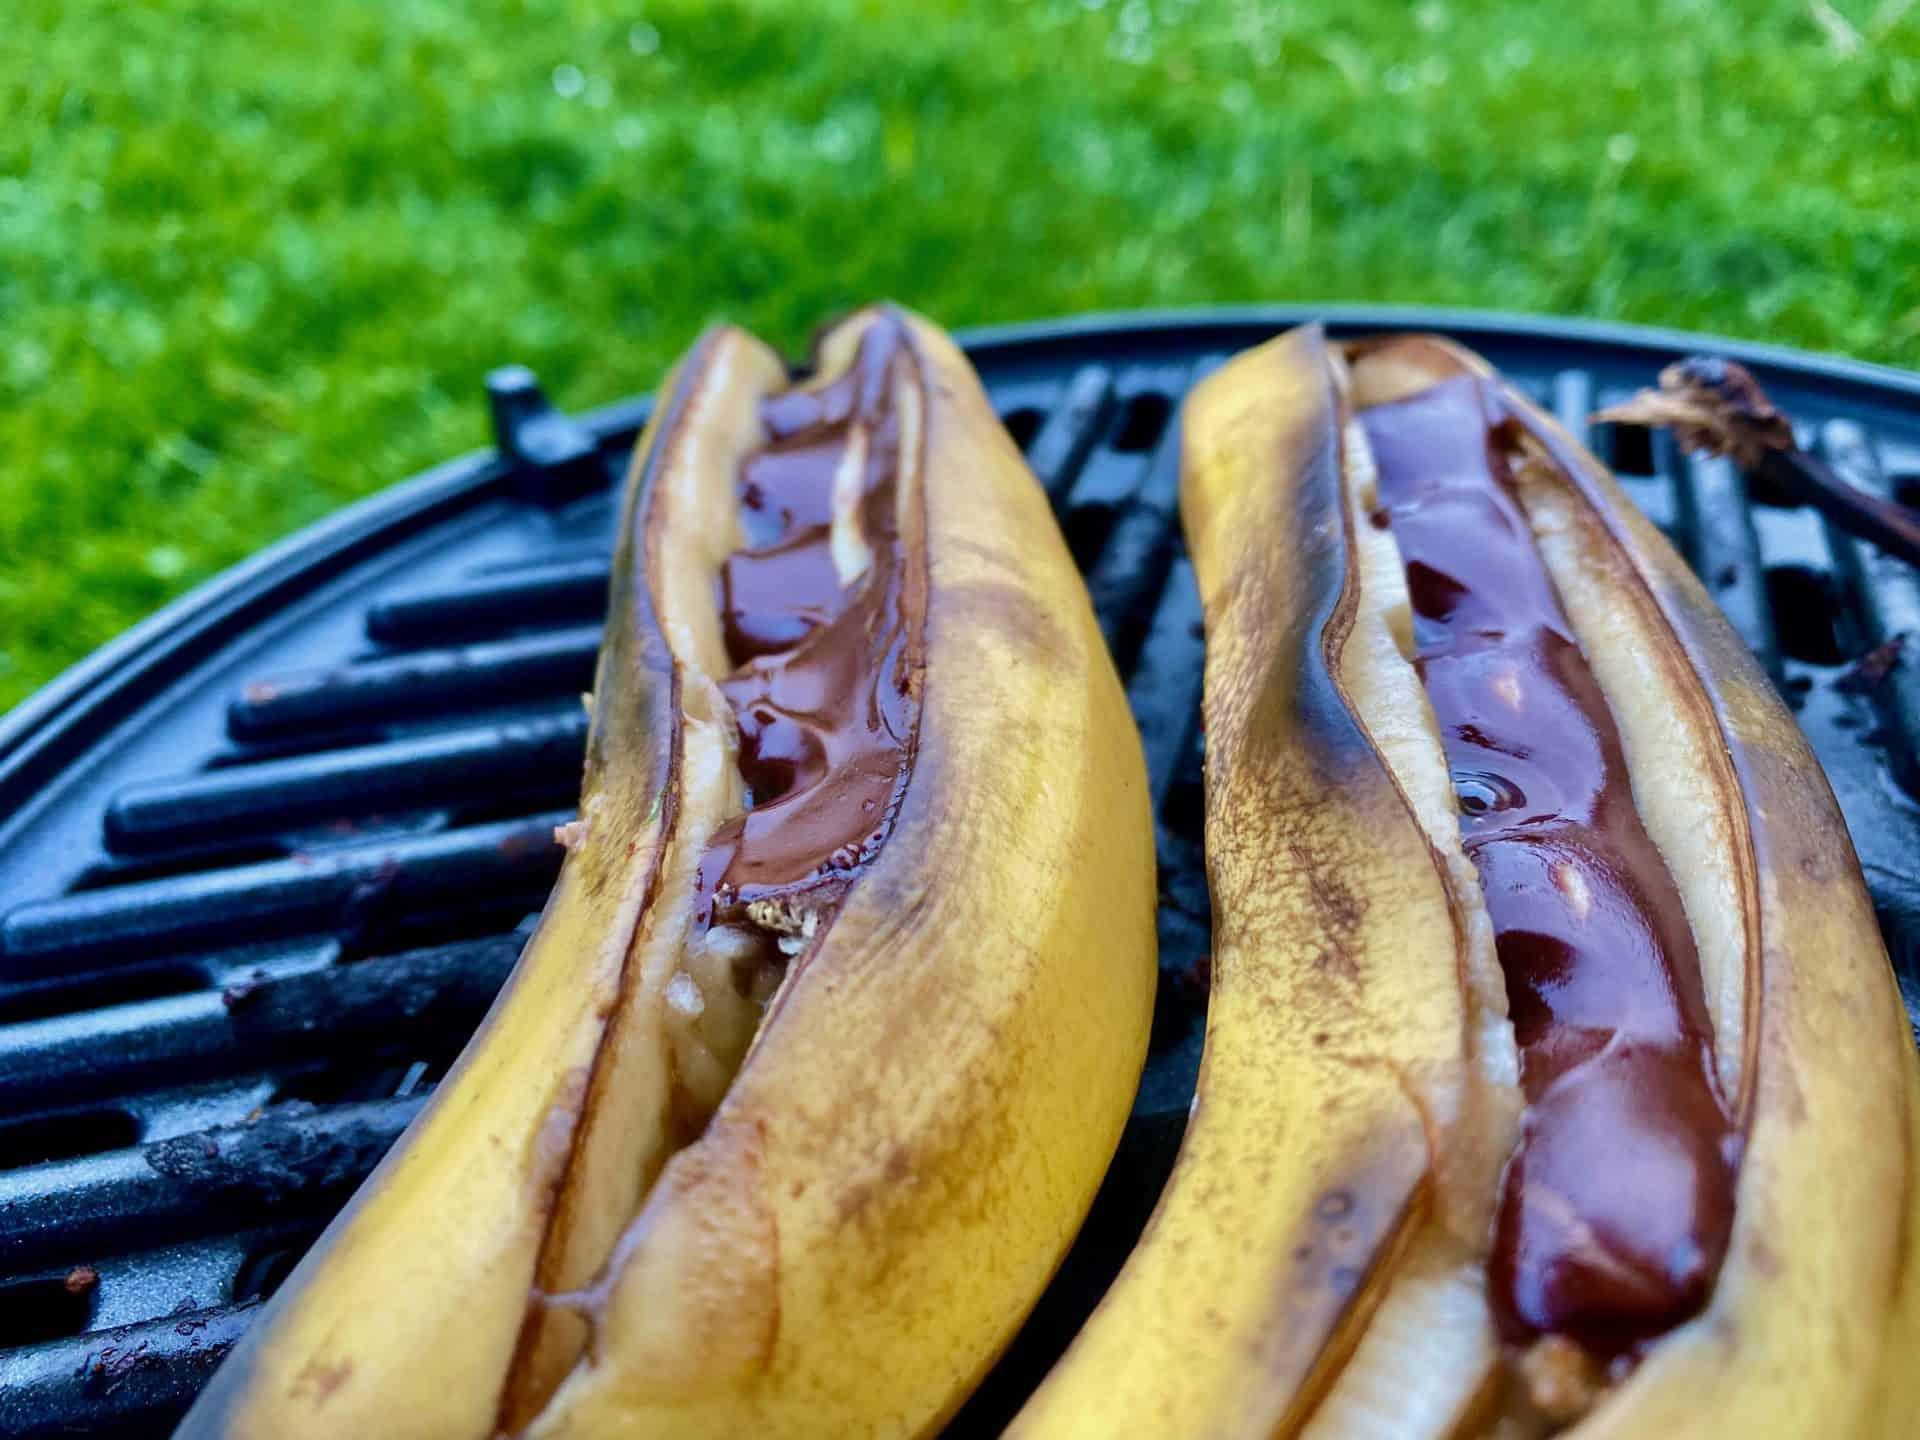 Cadac_Safari_Chef_2_Nachtisch_Bananen_Kinderschokolade